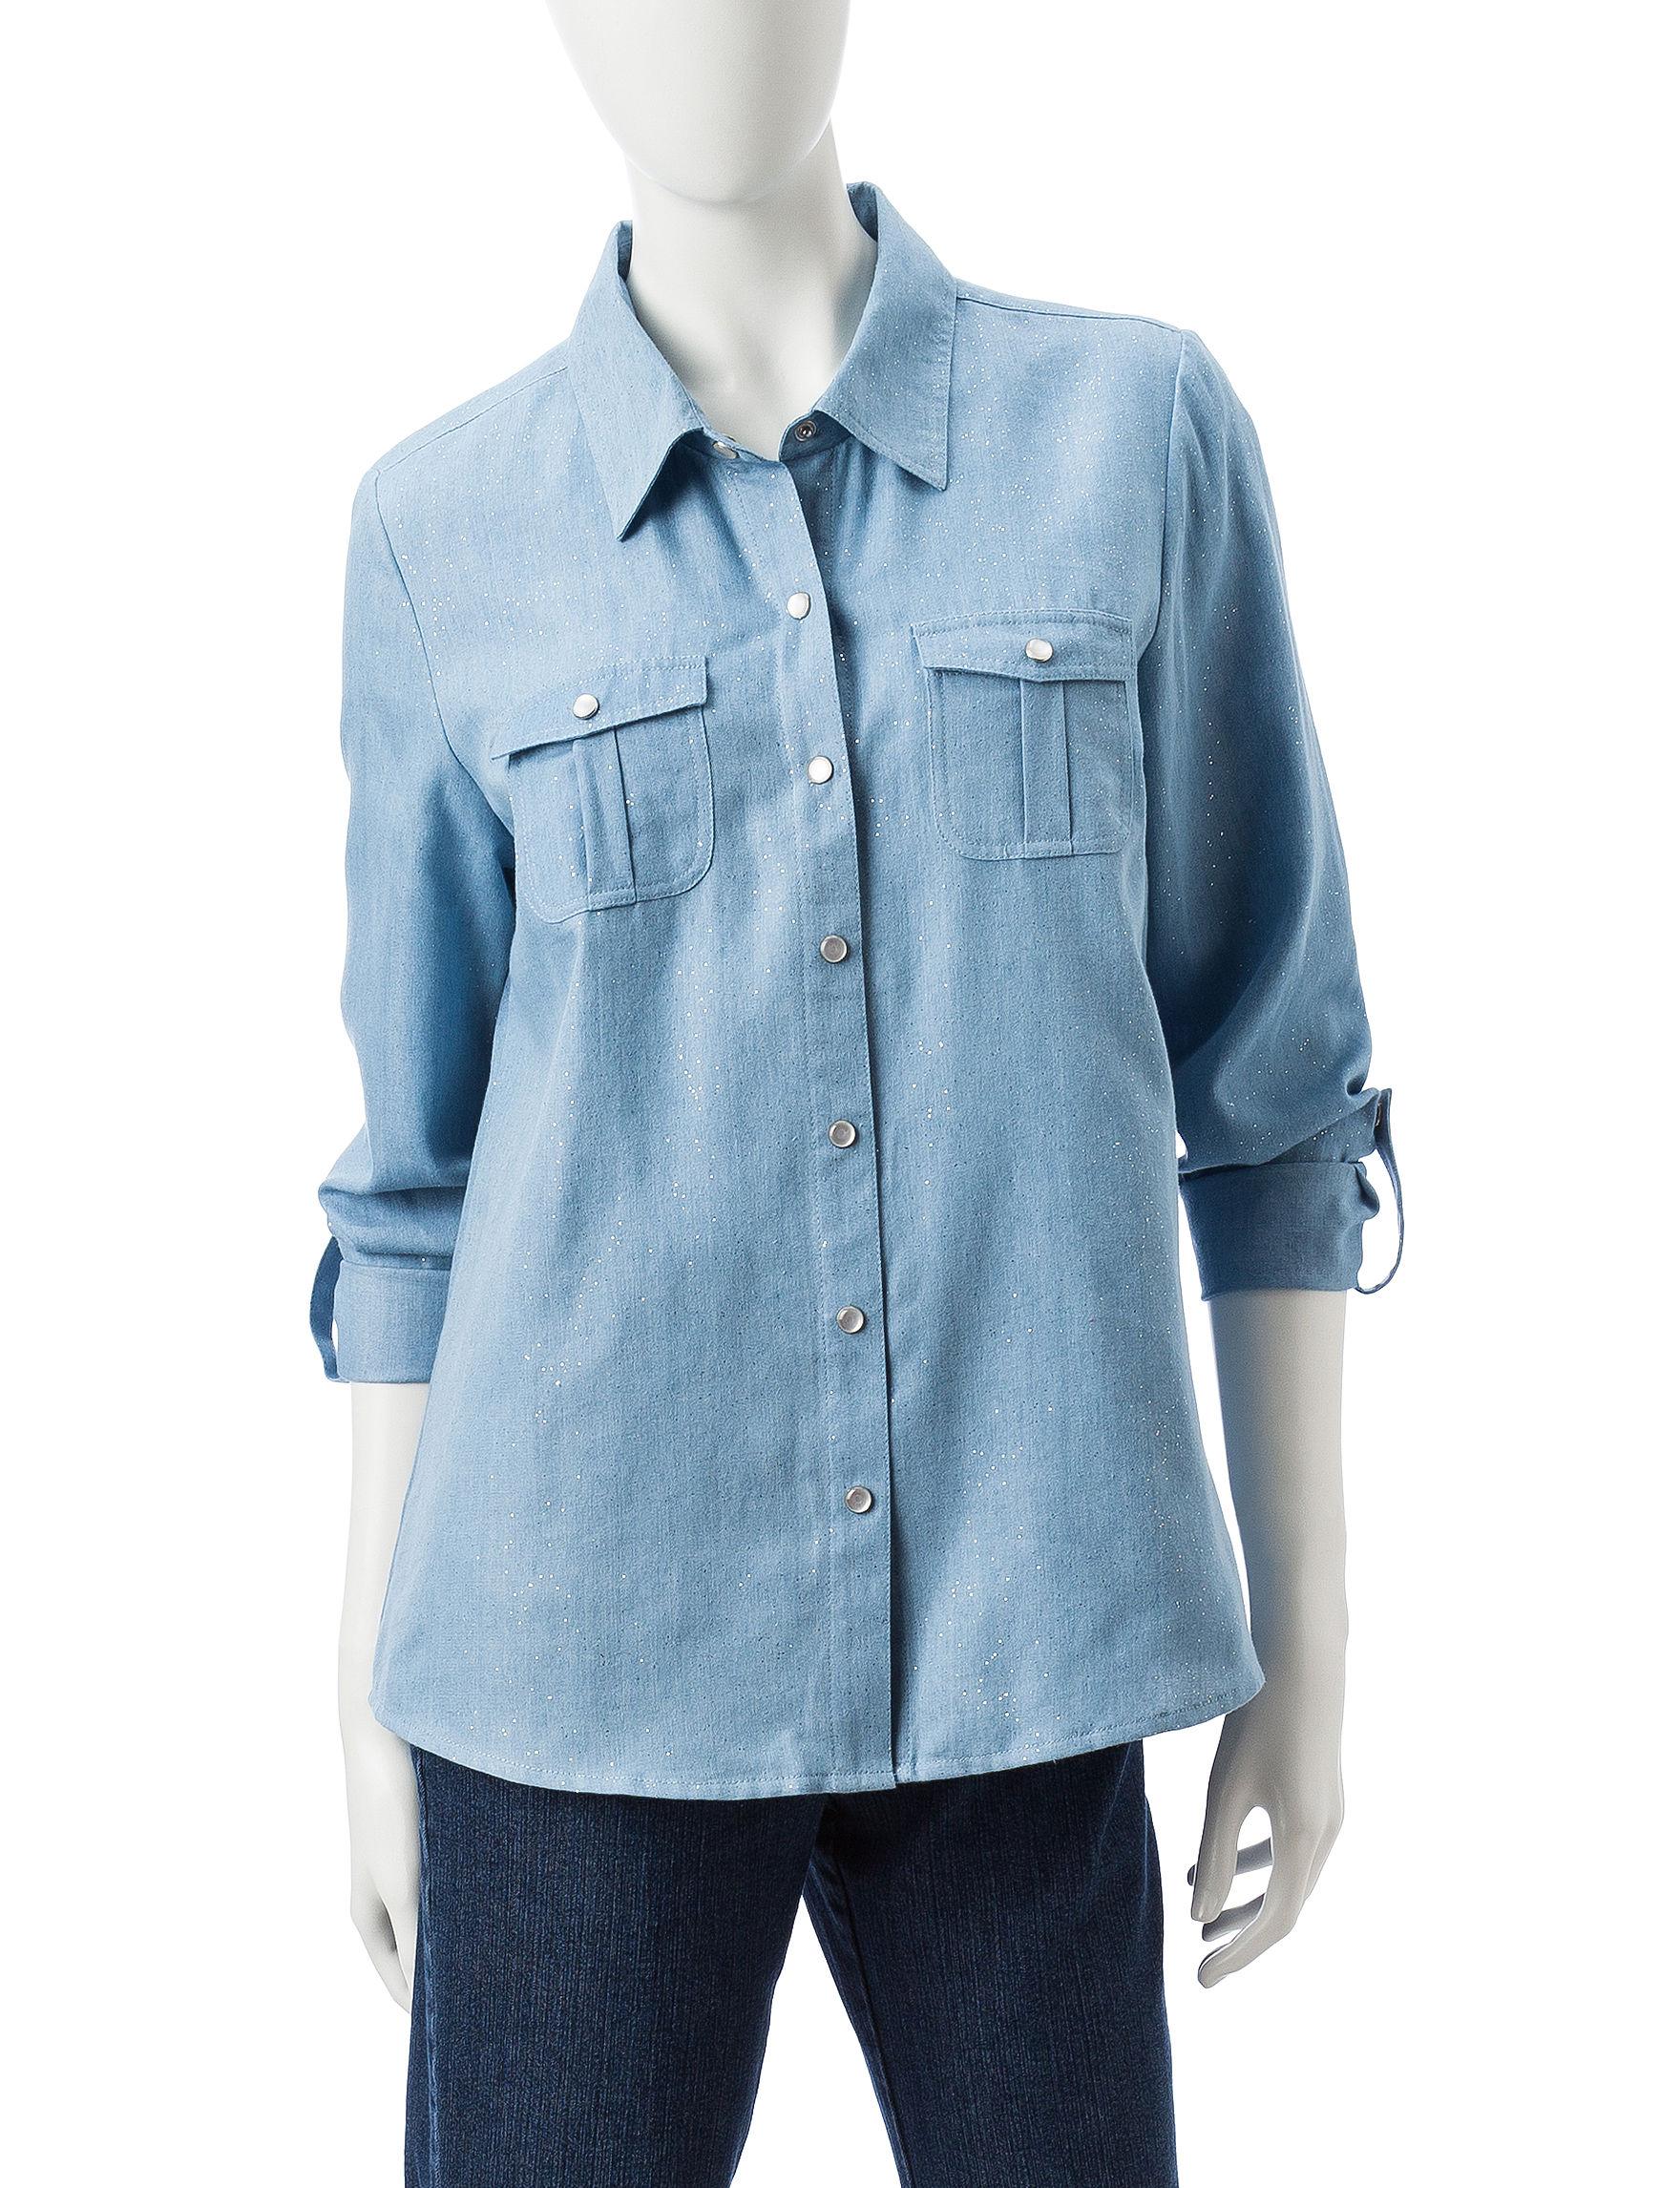 Cathy Daniels Chambray Shirts & Blouses